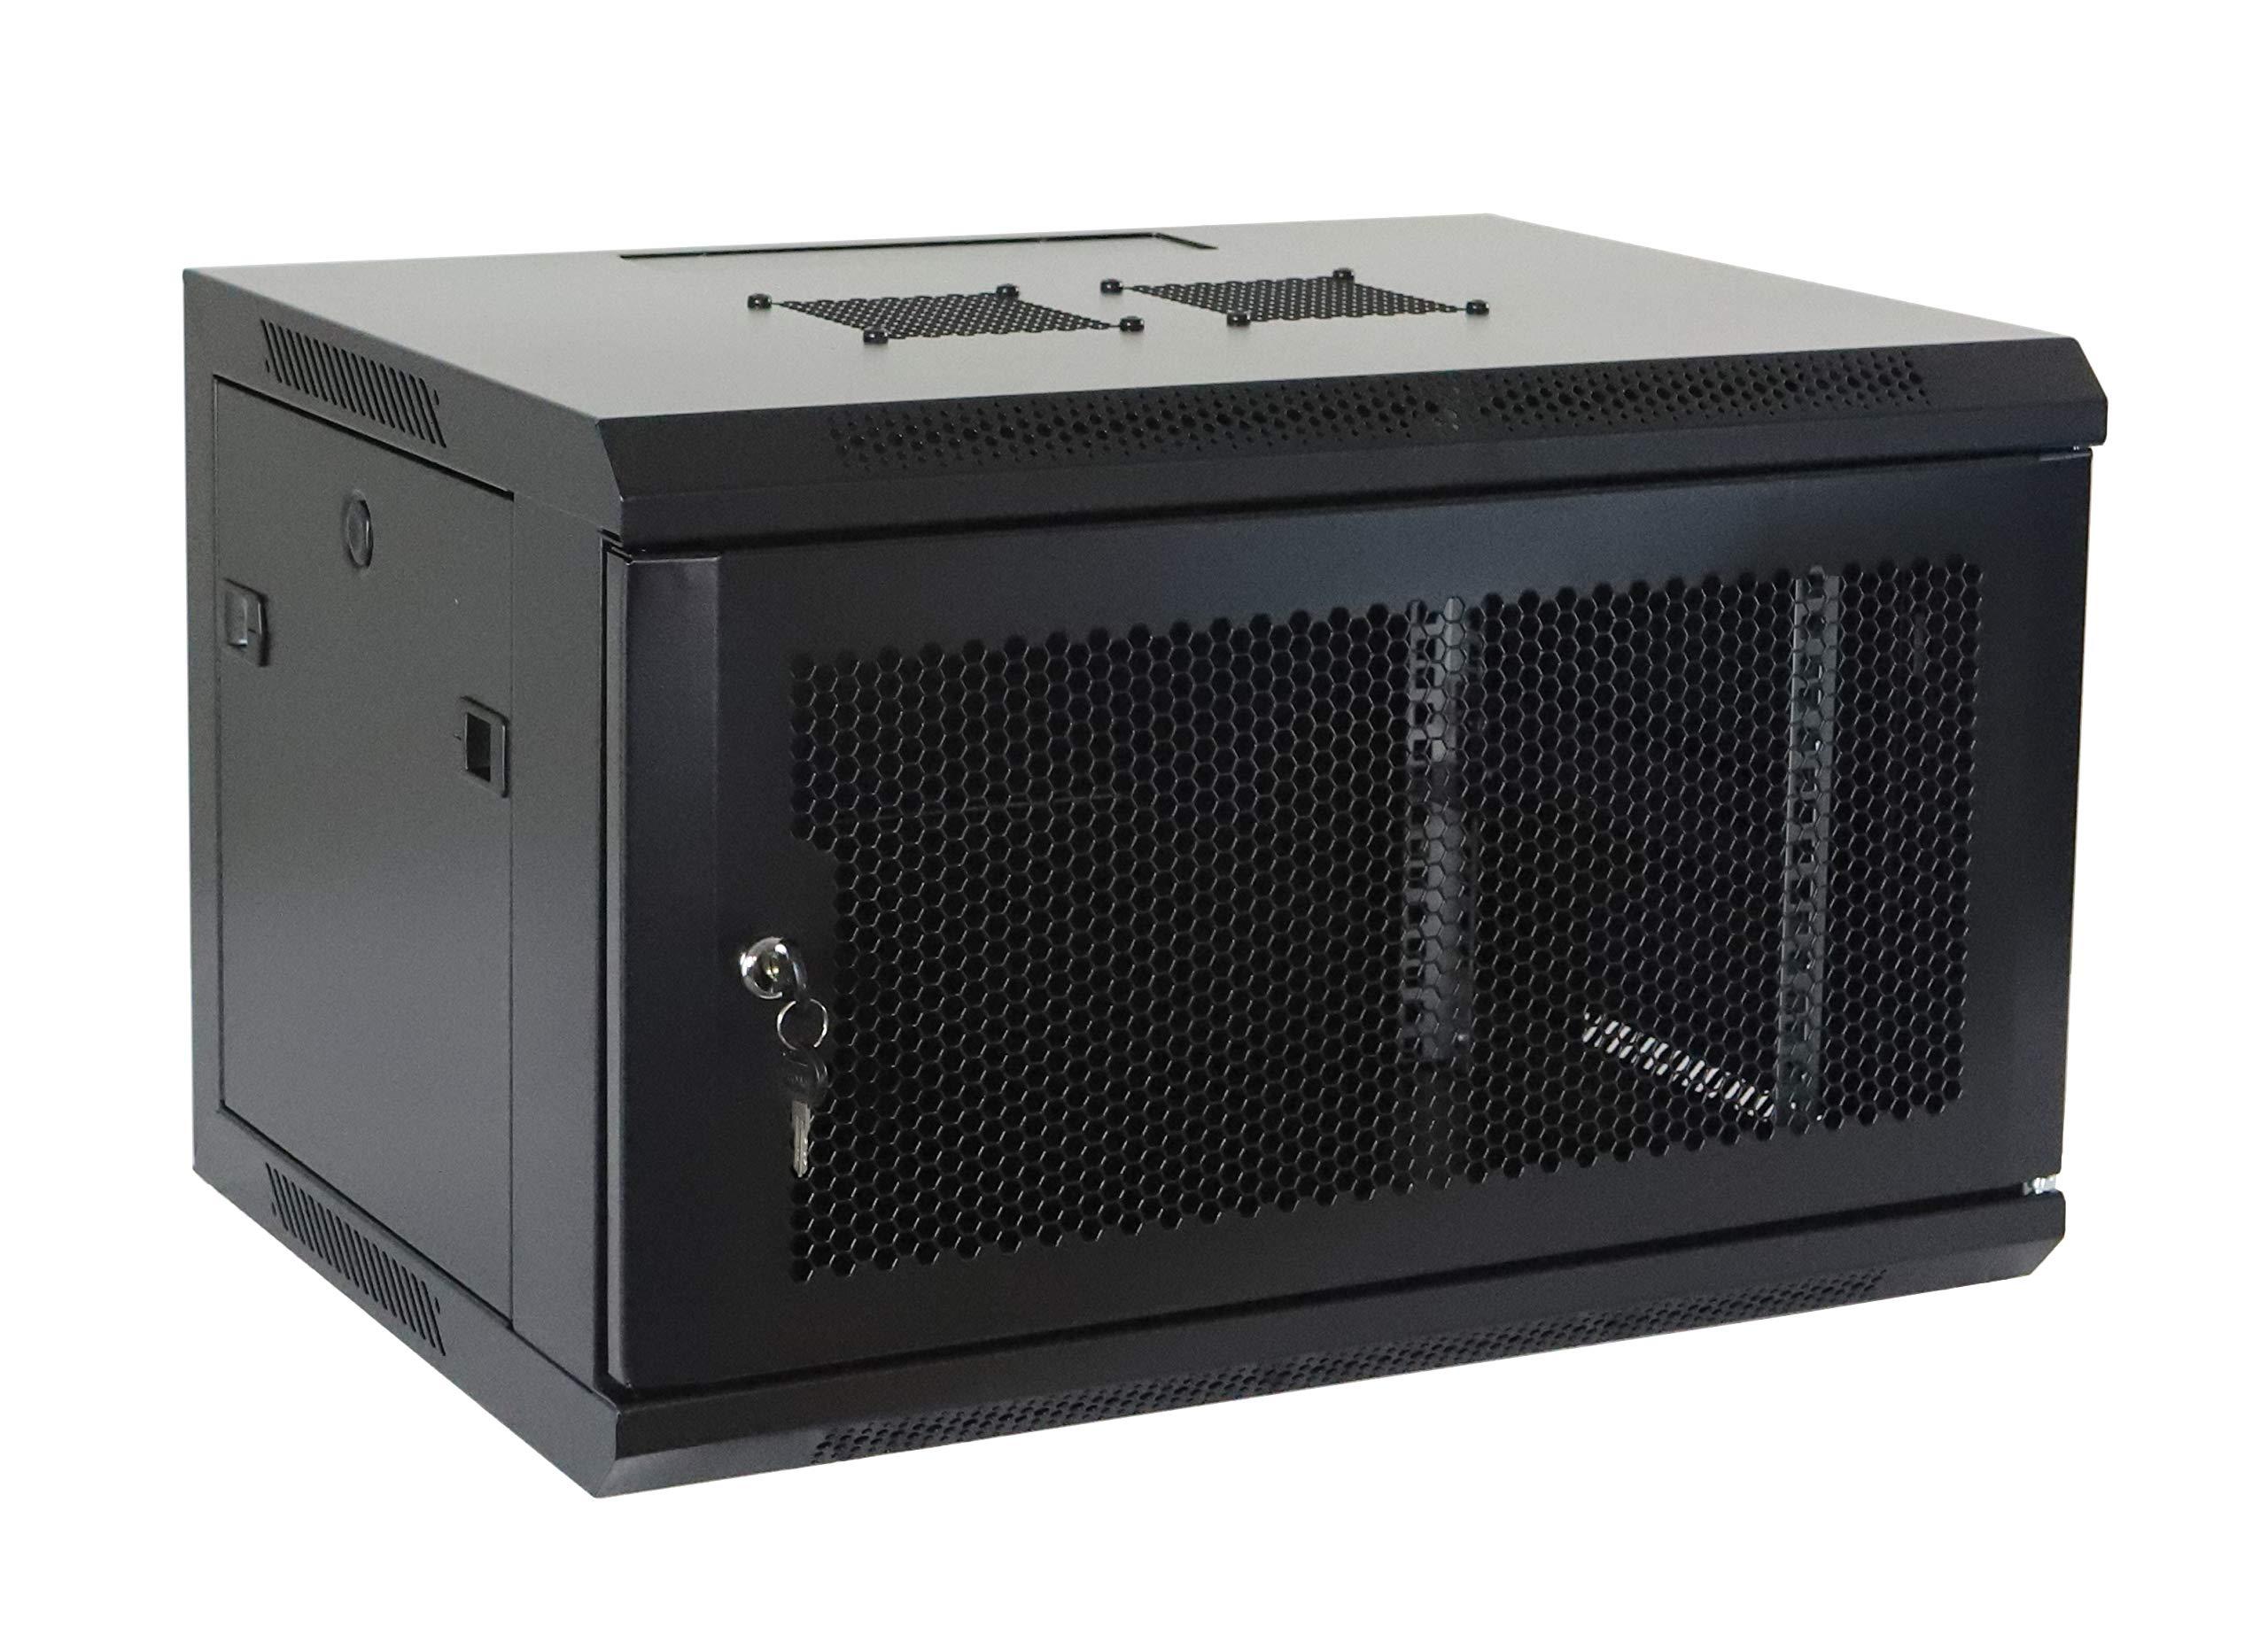 6U Professional Wall Mount Network Server Cabinet Enclosure 19-Inch Server Network Rack Black by AEONS